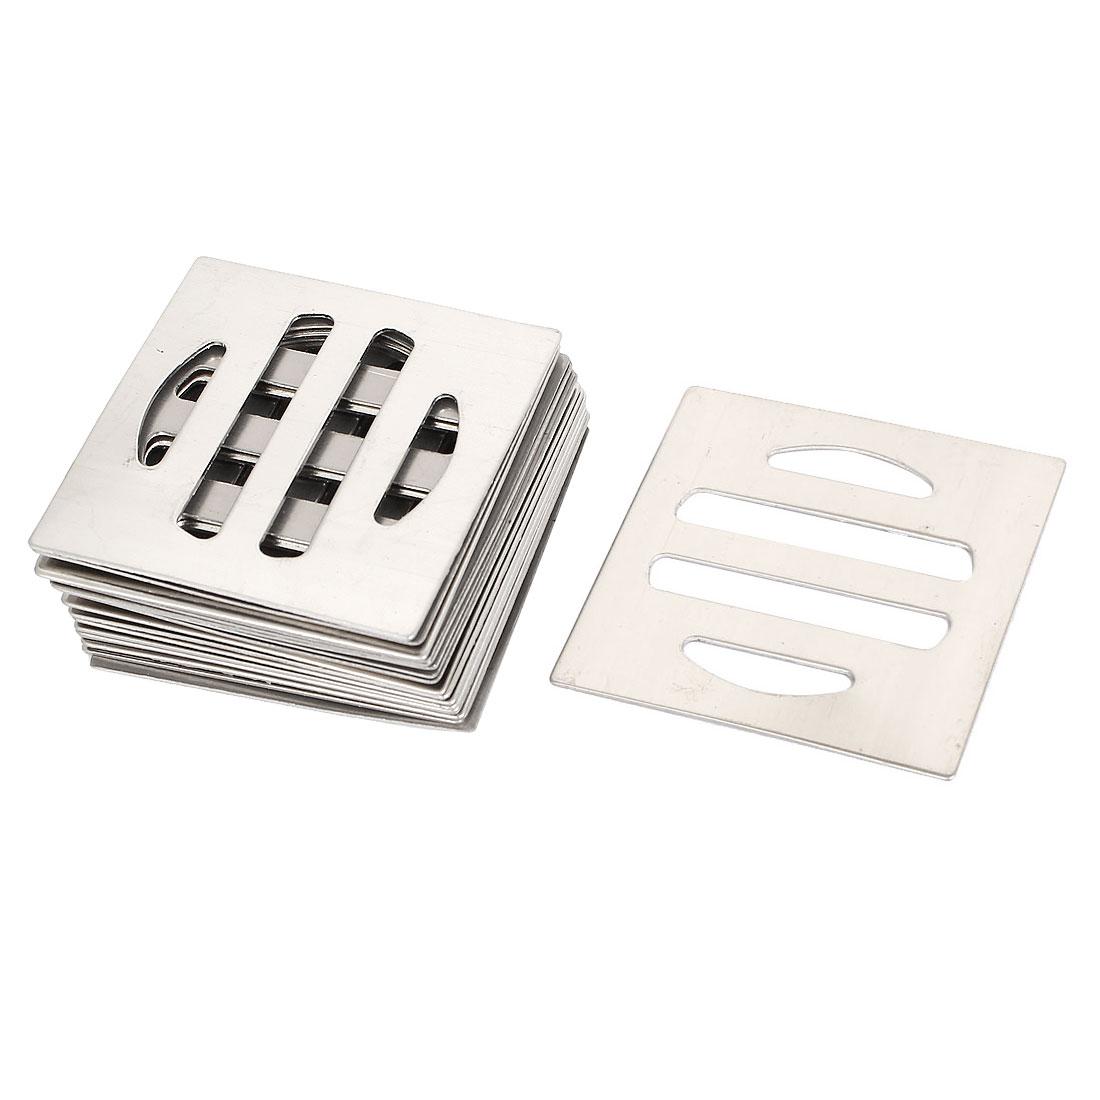 Bathroom Kitchen Shower Square Metal Floor Drain Strainer 50mm Length 20pcs